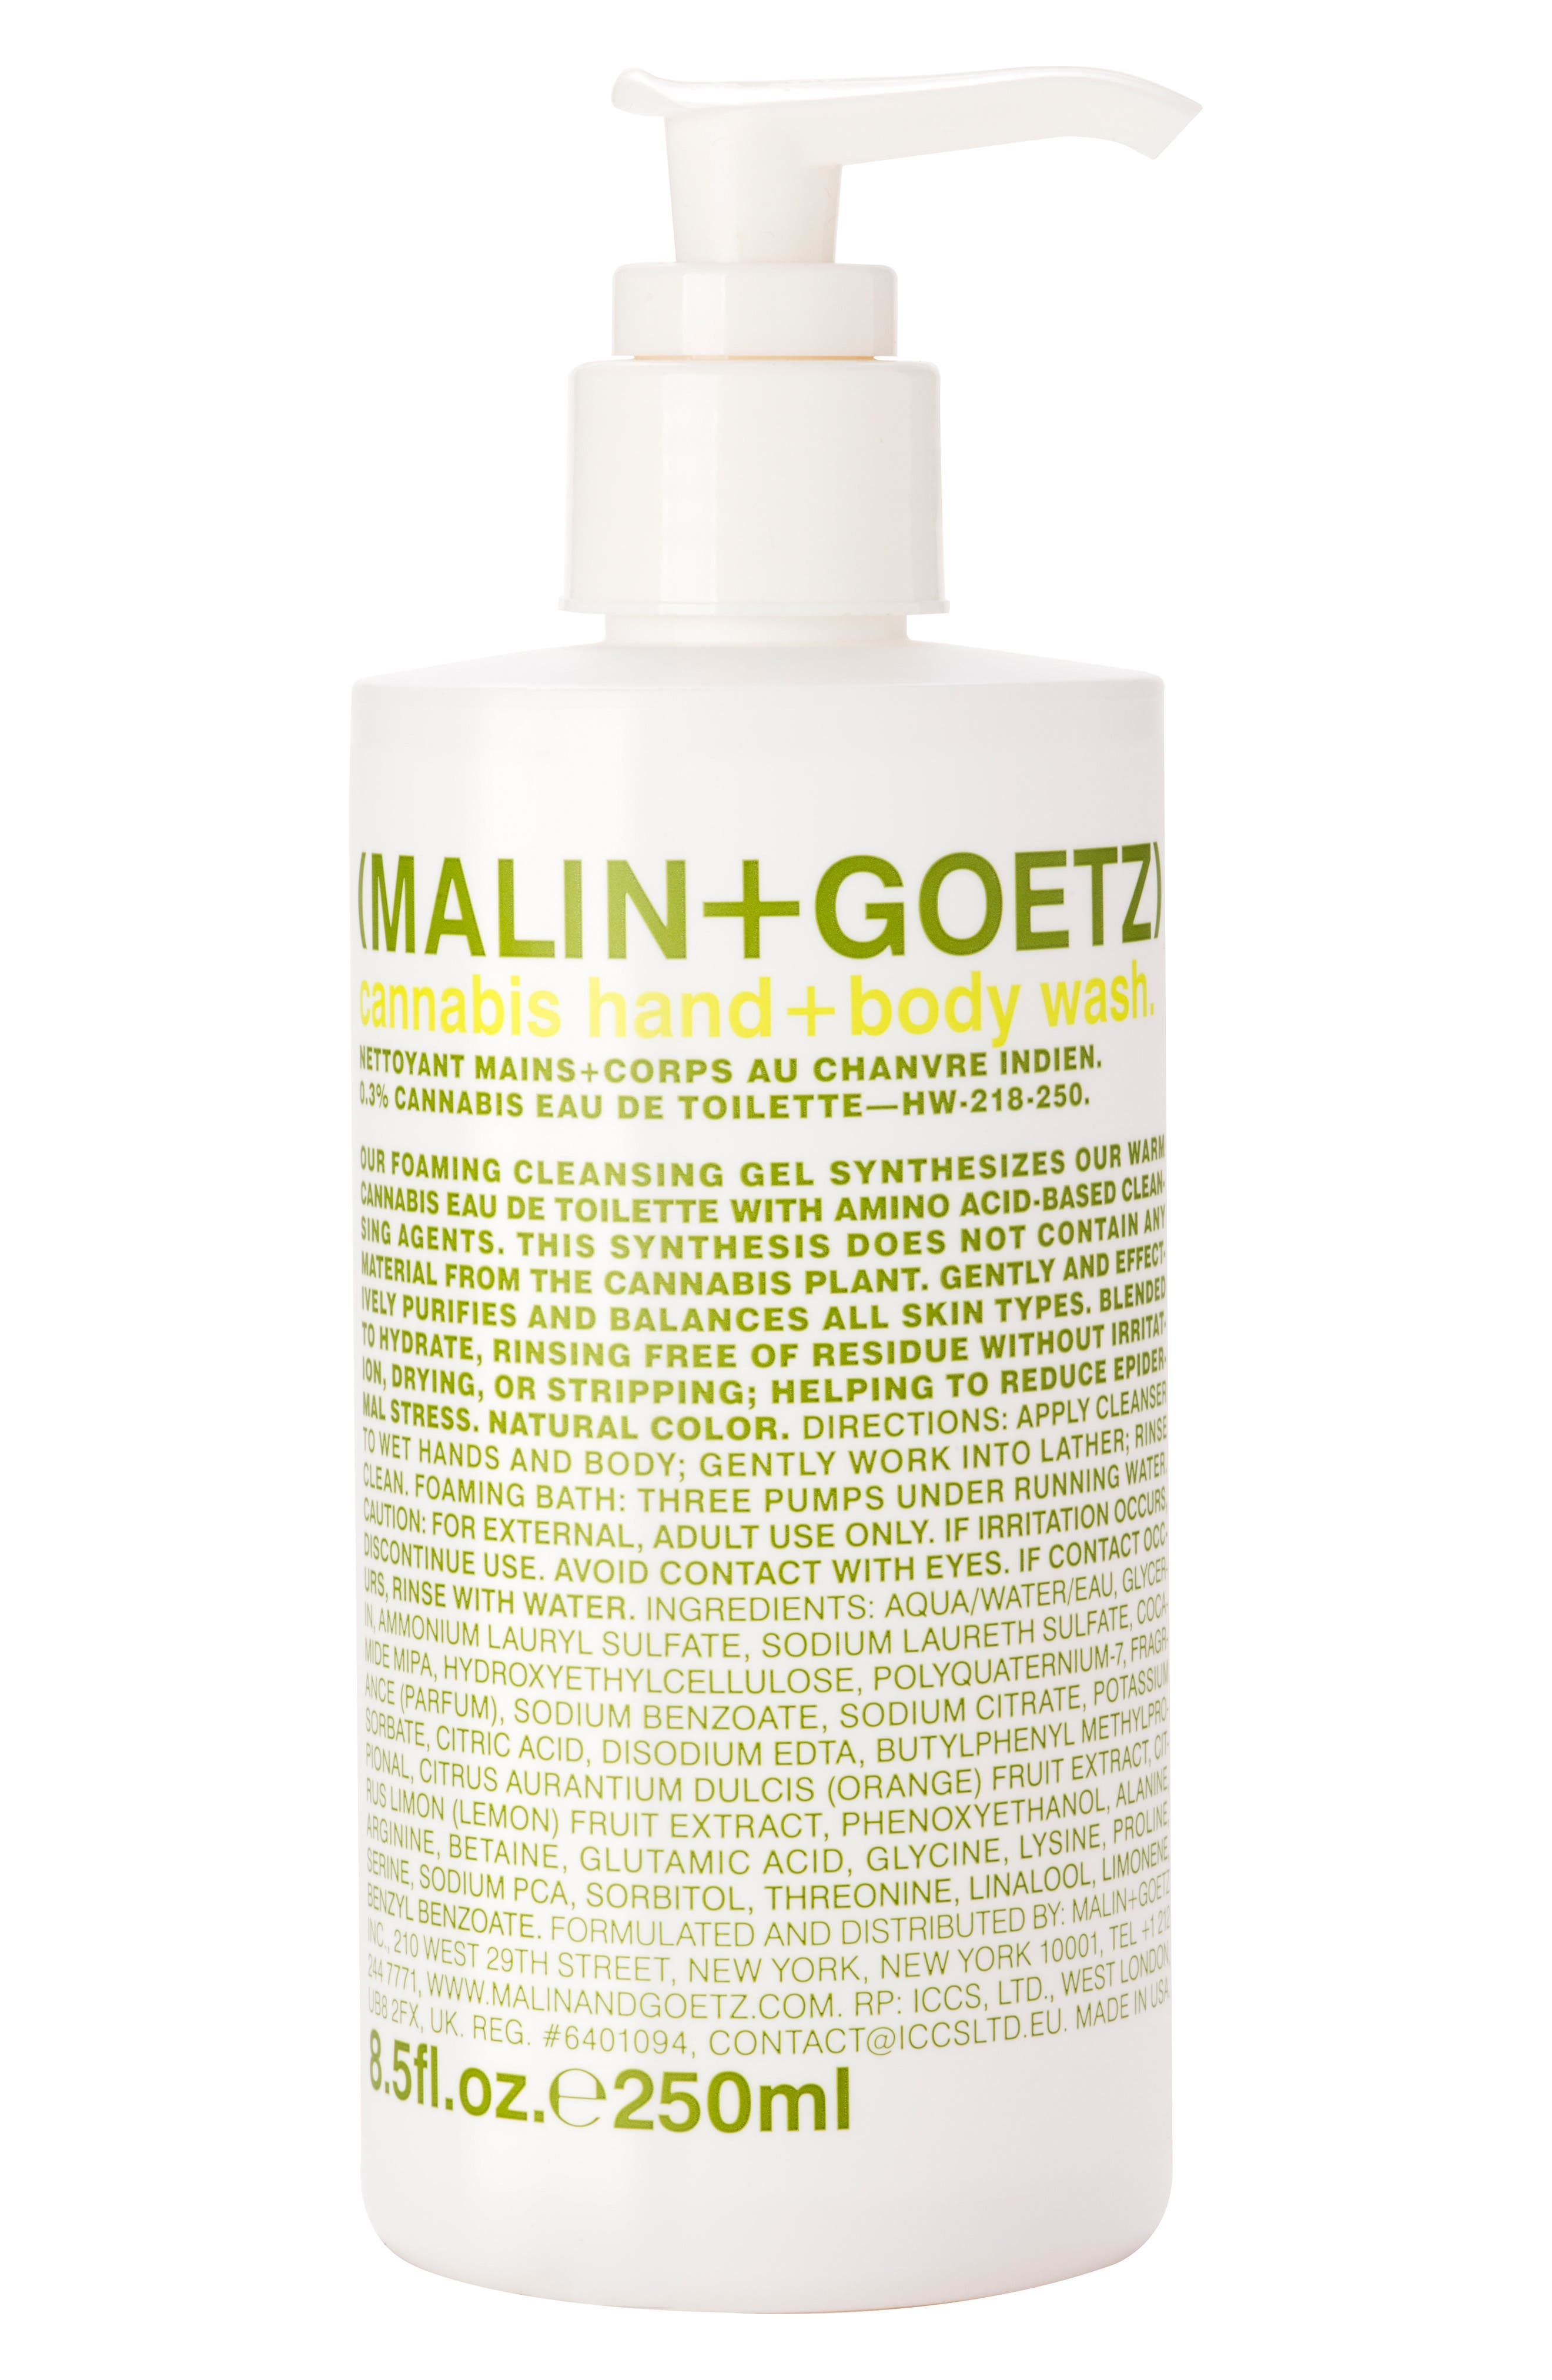 MALIN+GOETZ Cannabis Hand & Body Wash